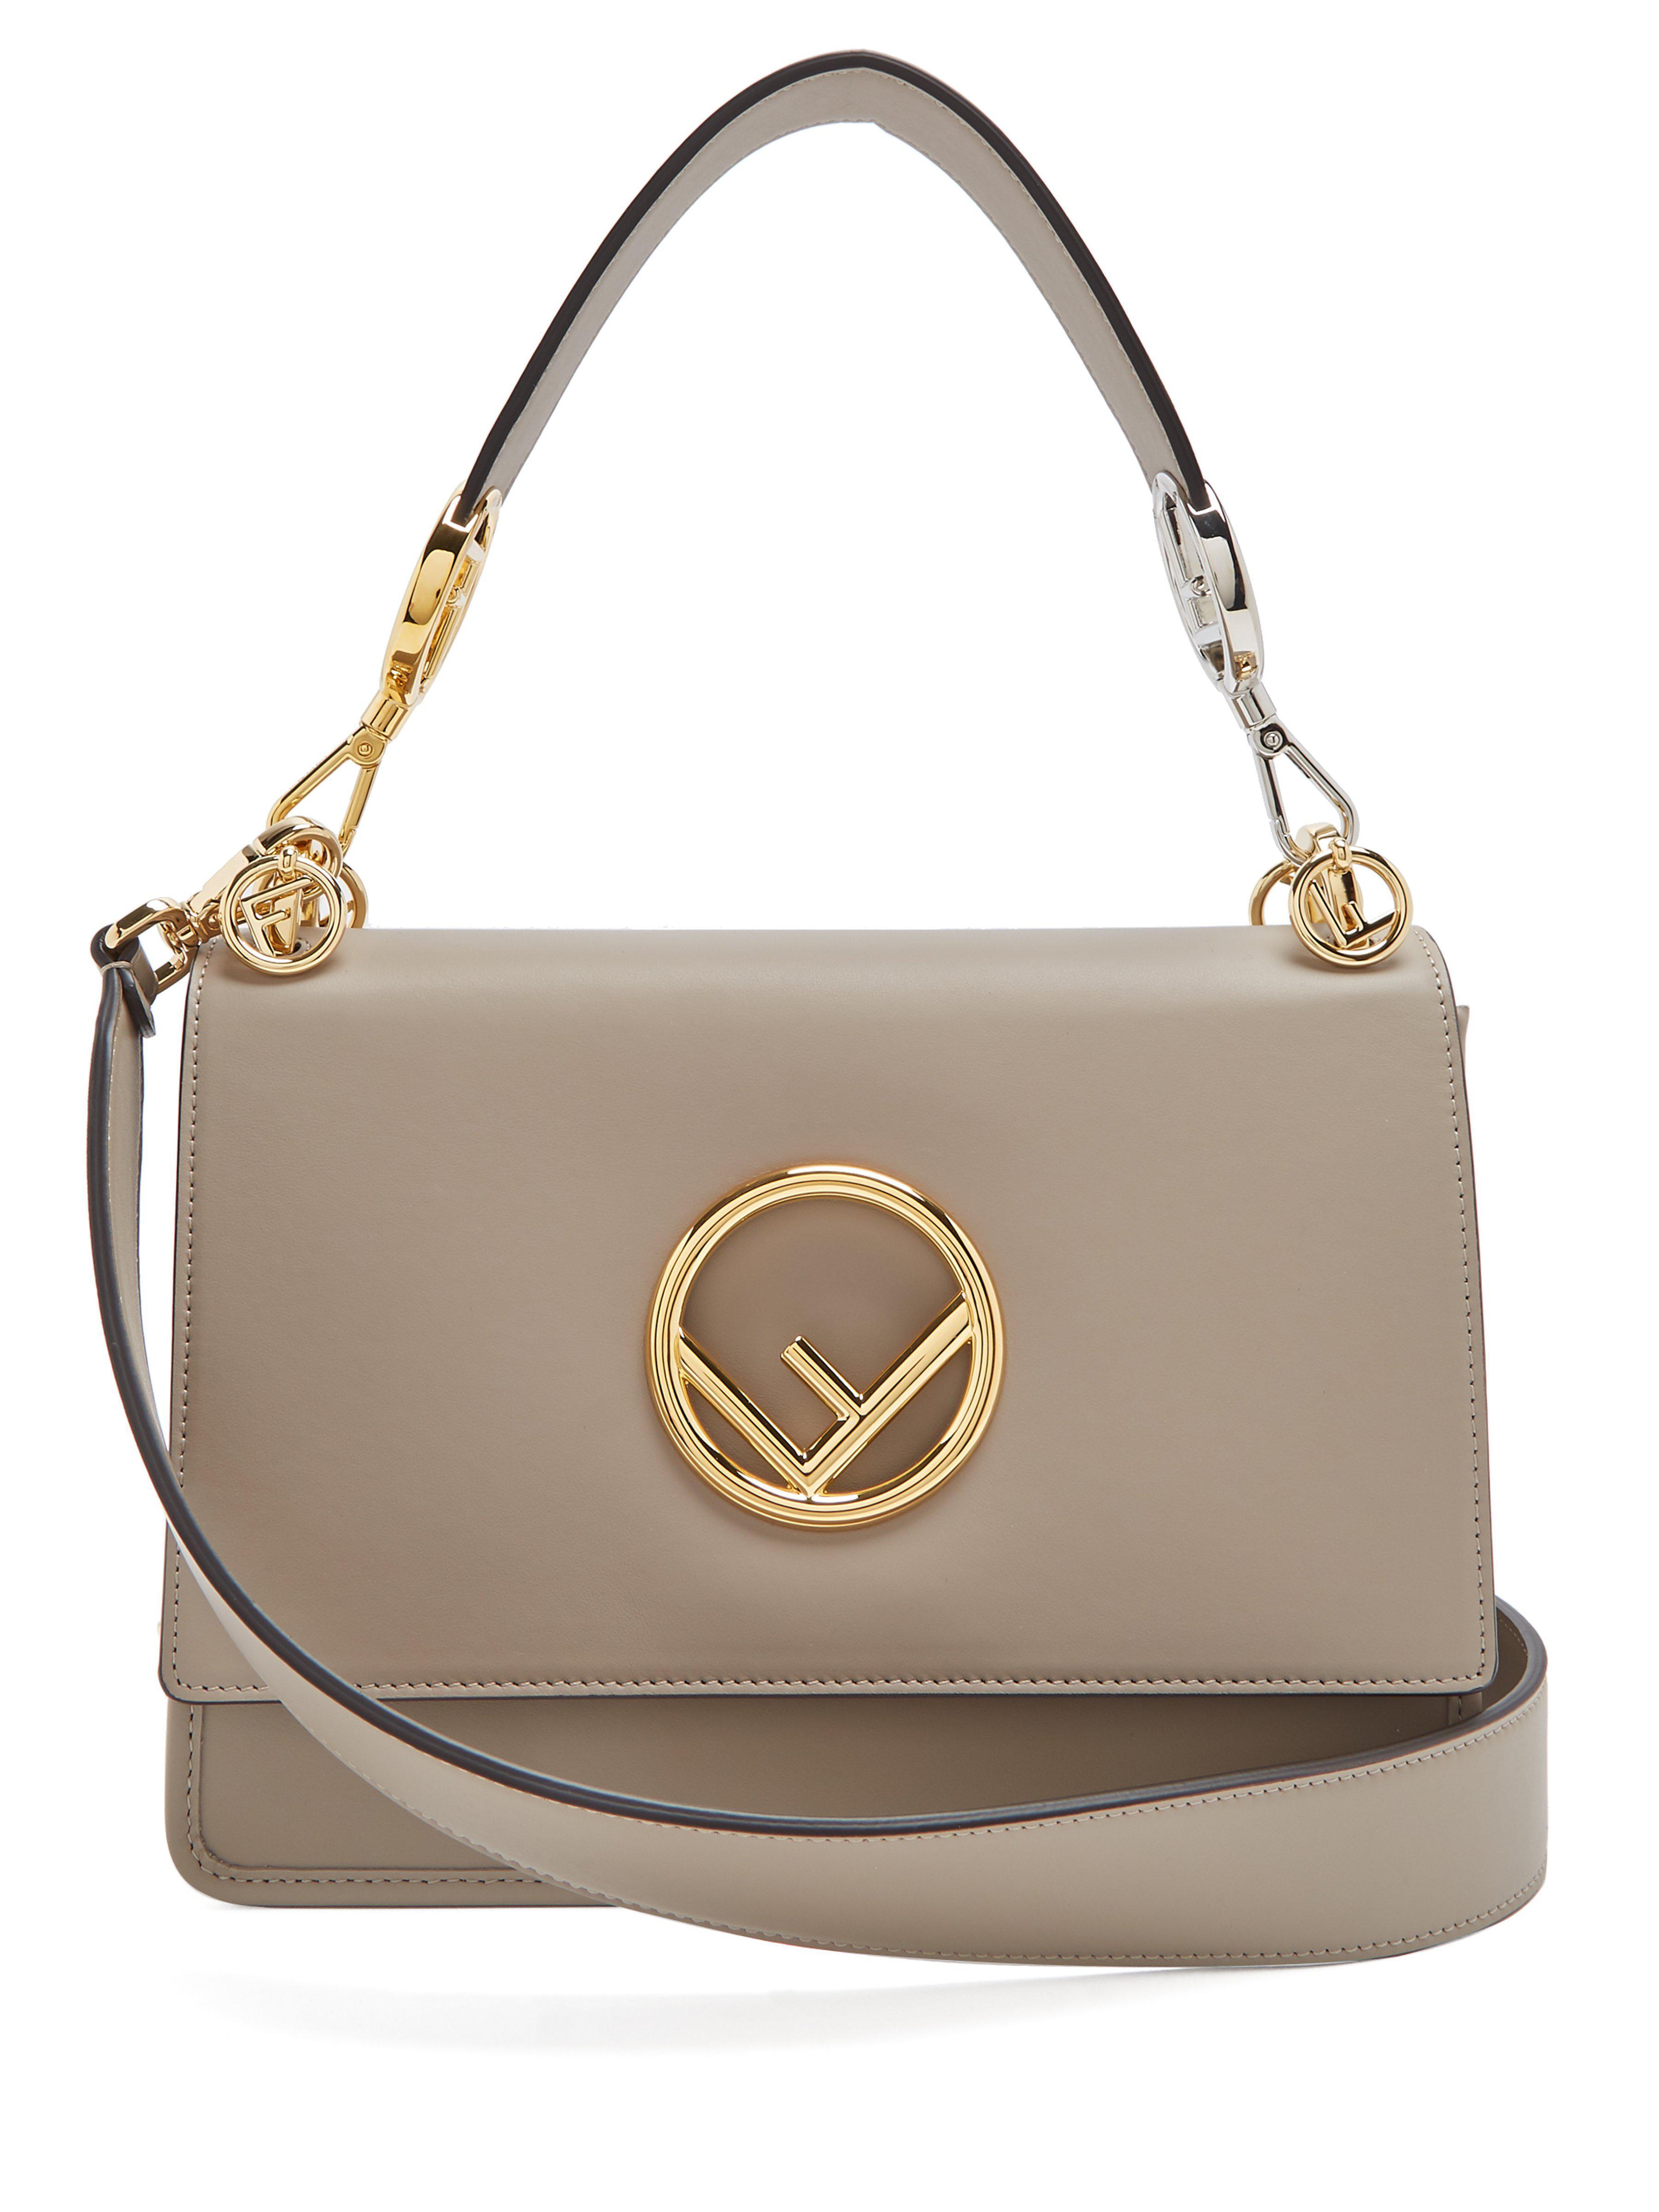 3e7f0b56dba0 Fendi Kan I Logo Leather Shoulder Bag in Gray - Lyst